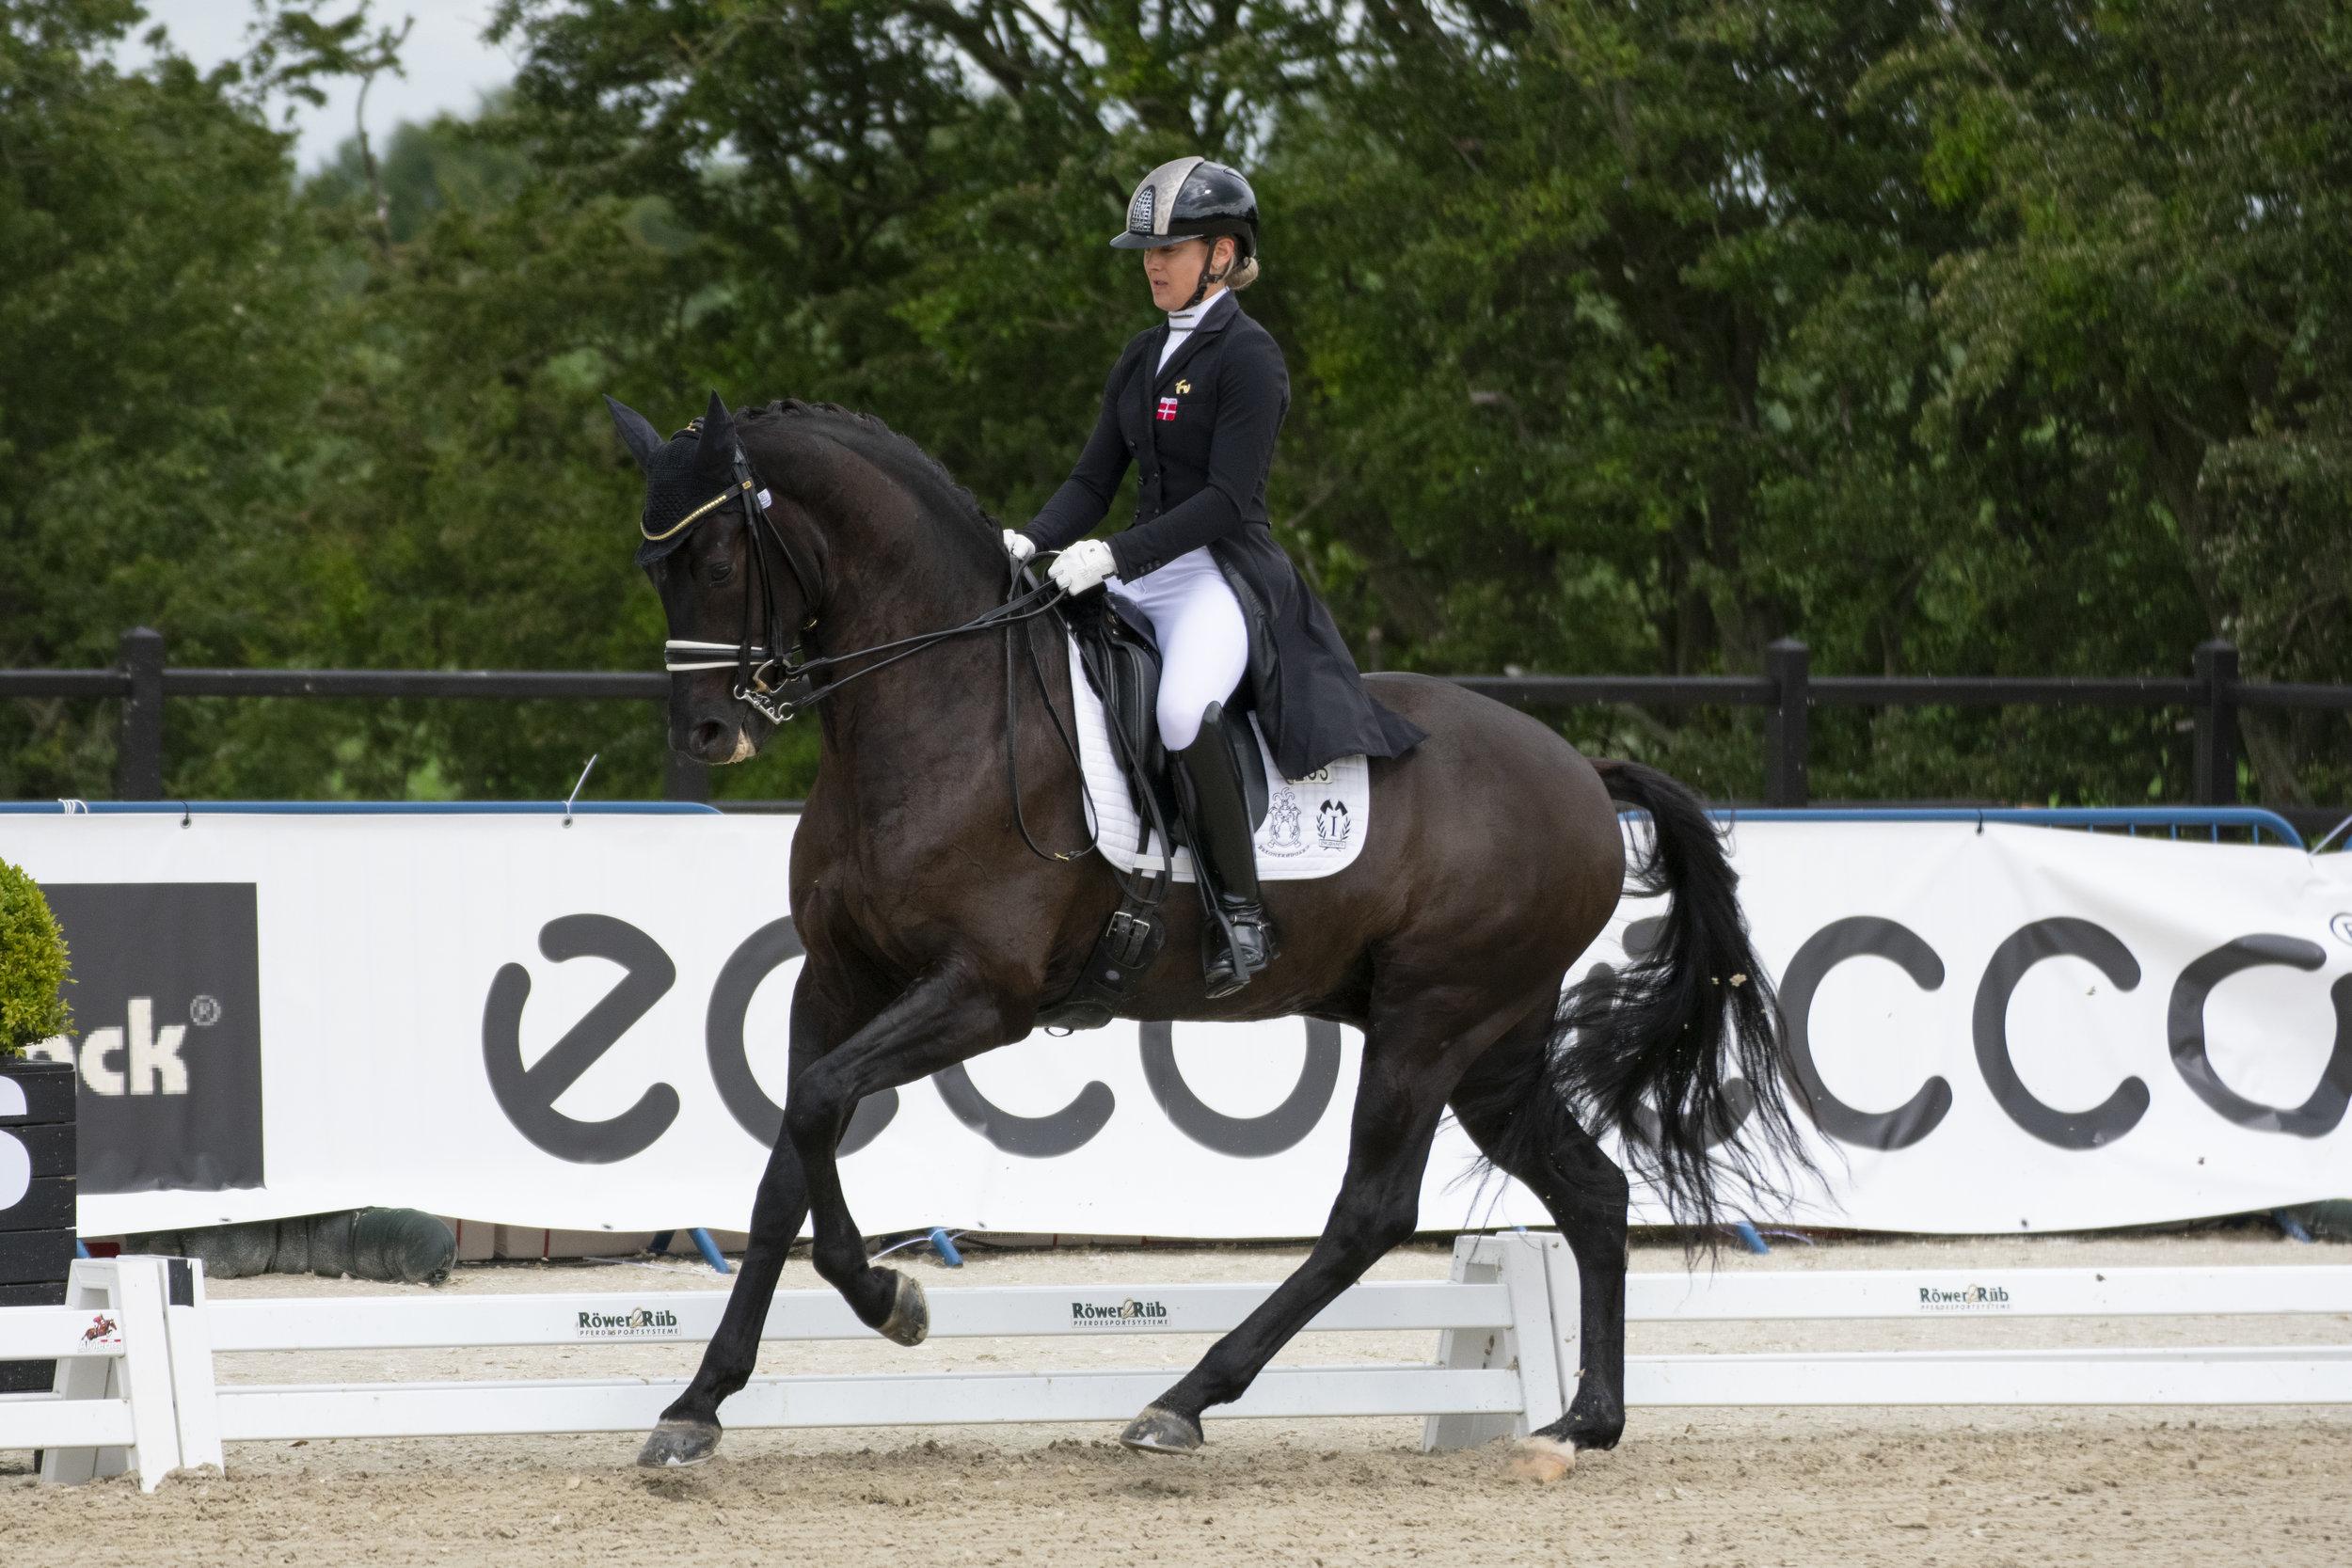 UNO Don Olympic with Anna Zibrandtsen - photo credit: Mia Bach